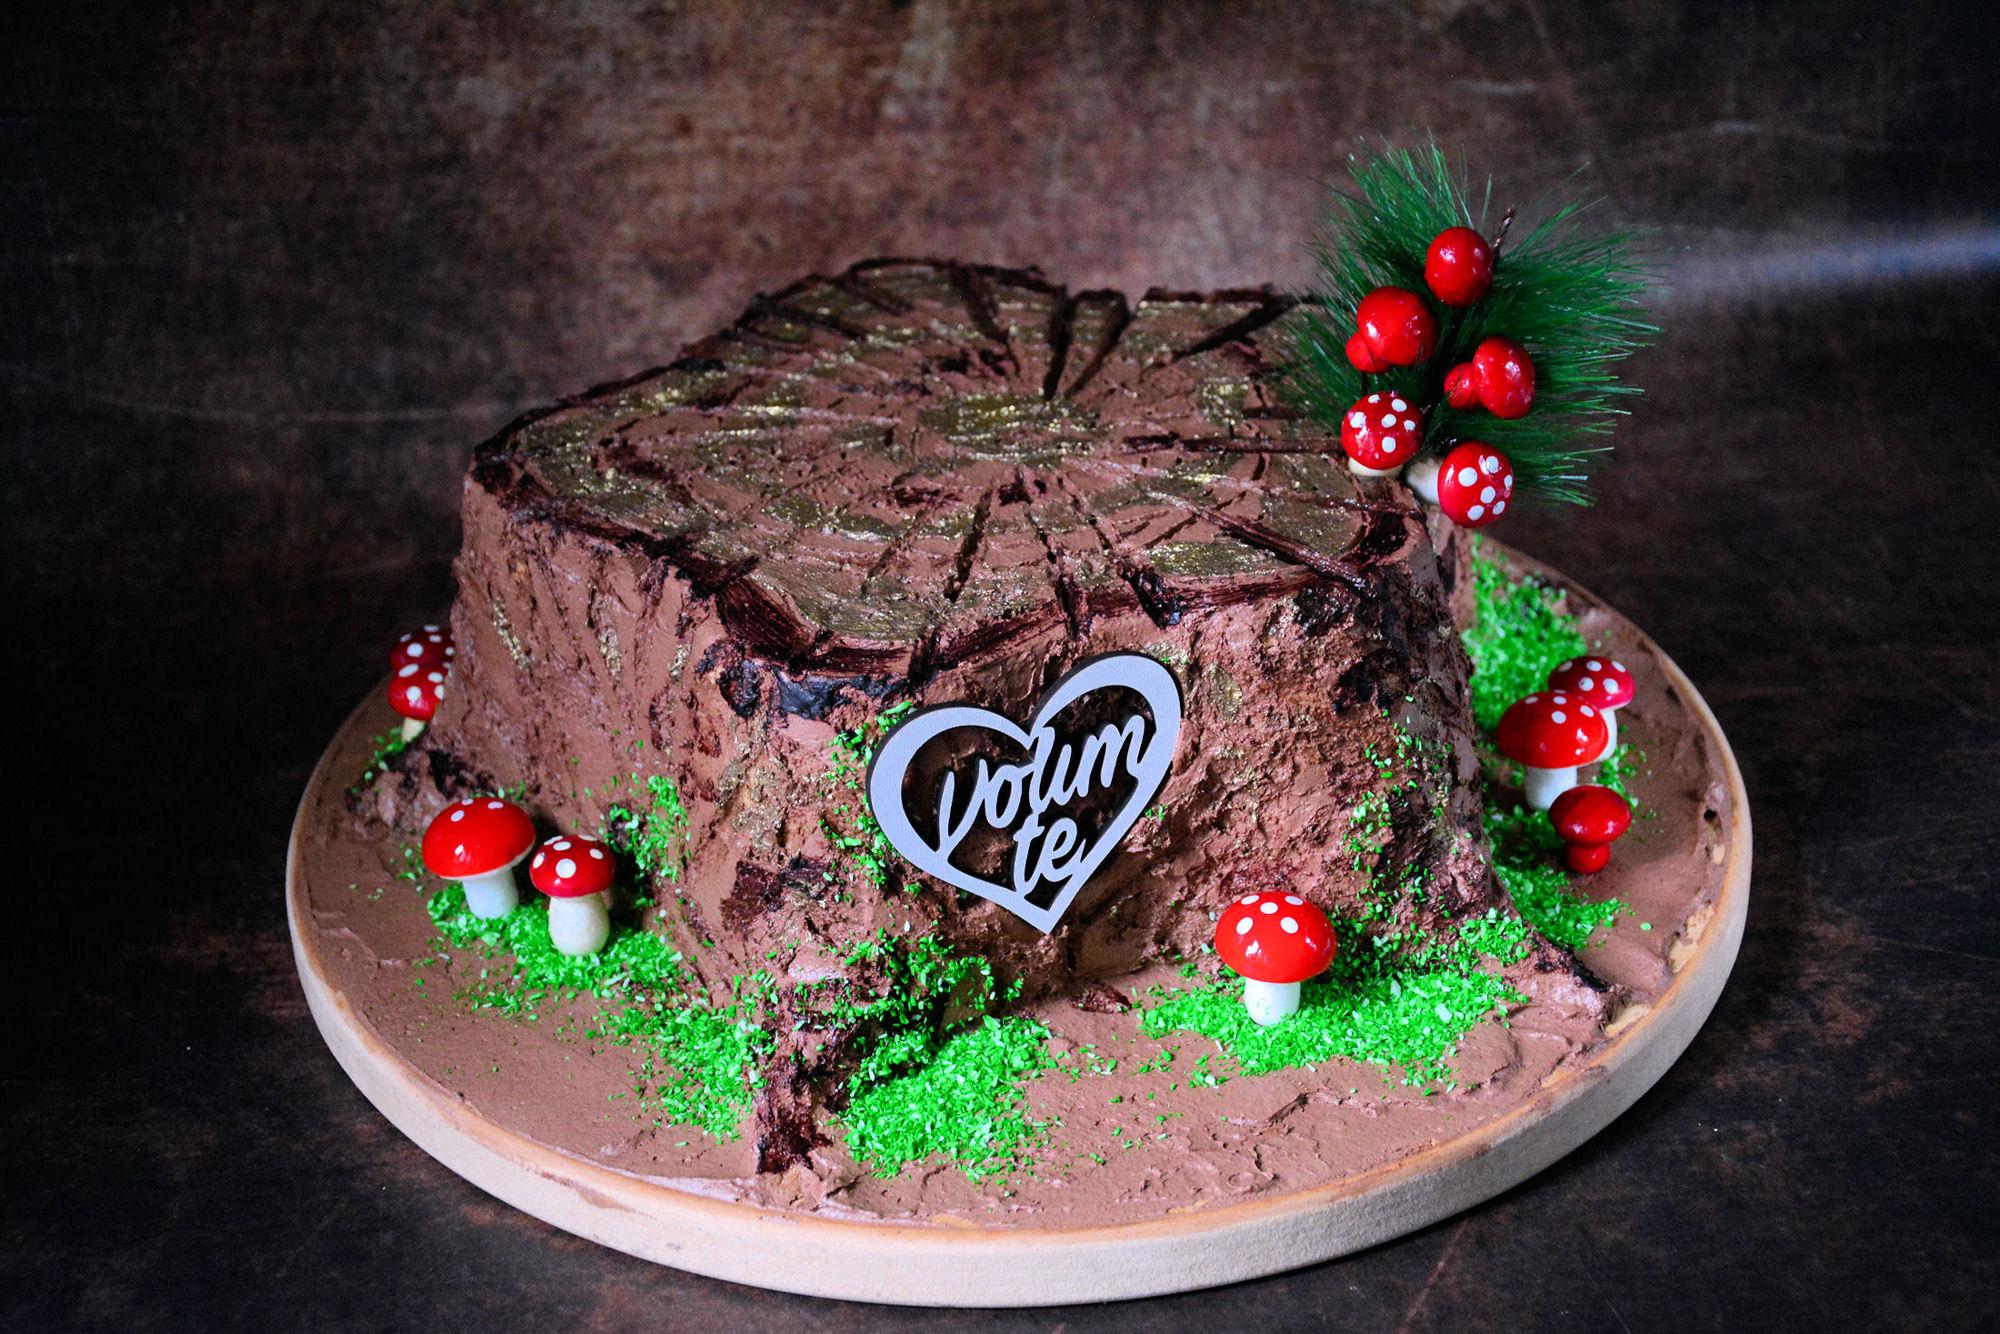 Panj torta (video)